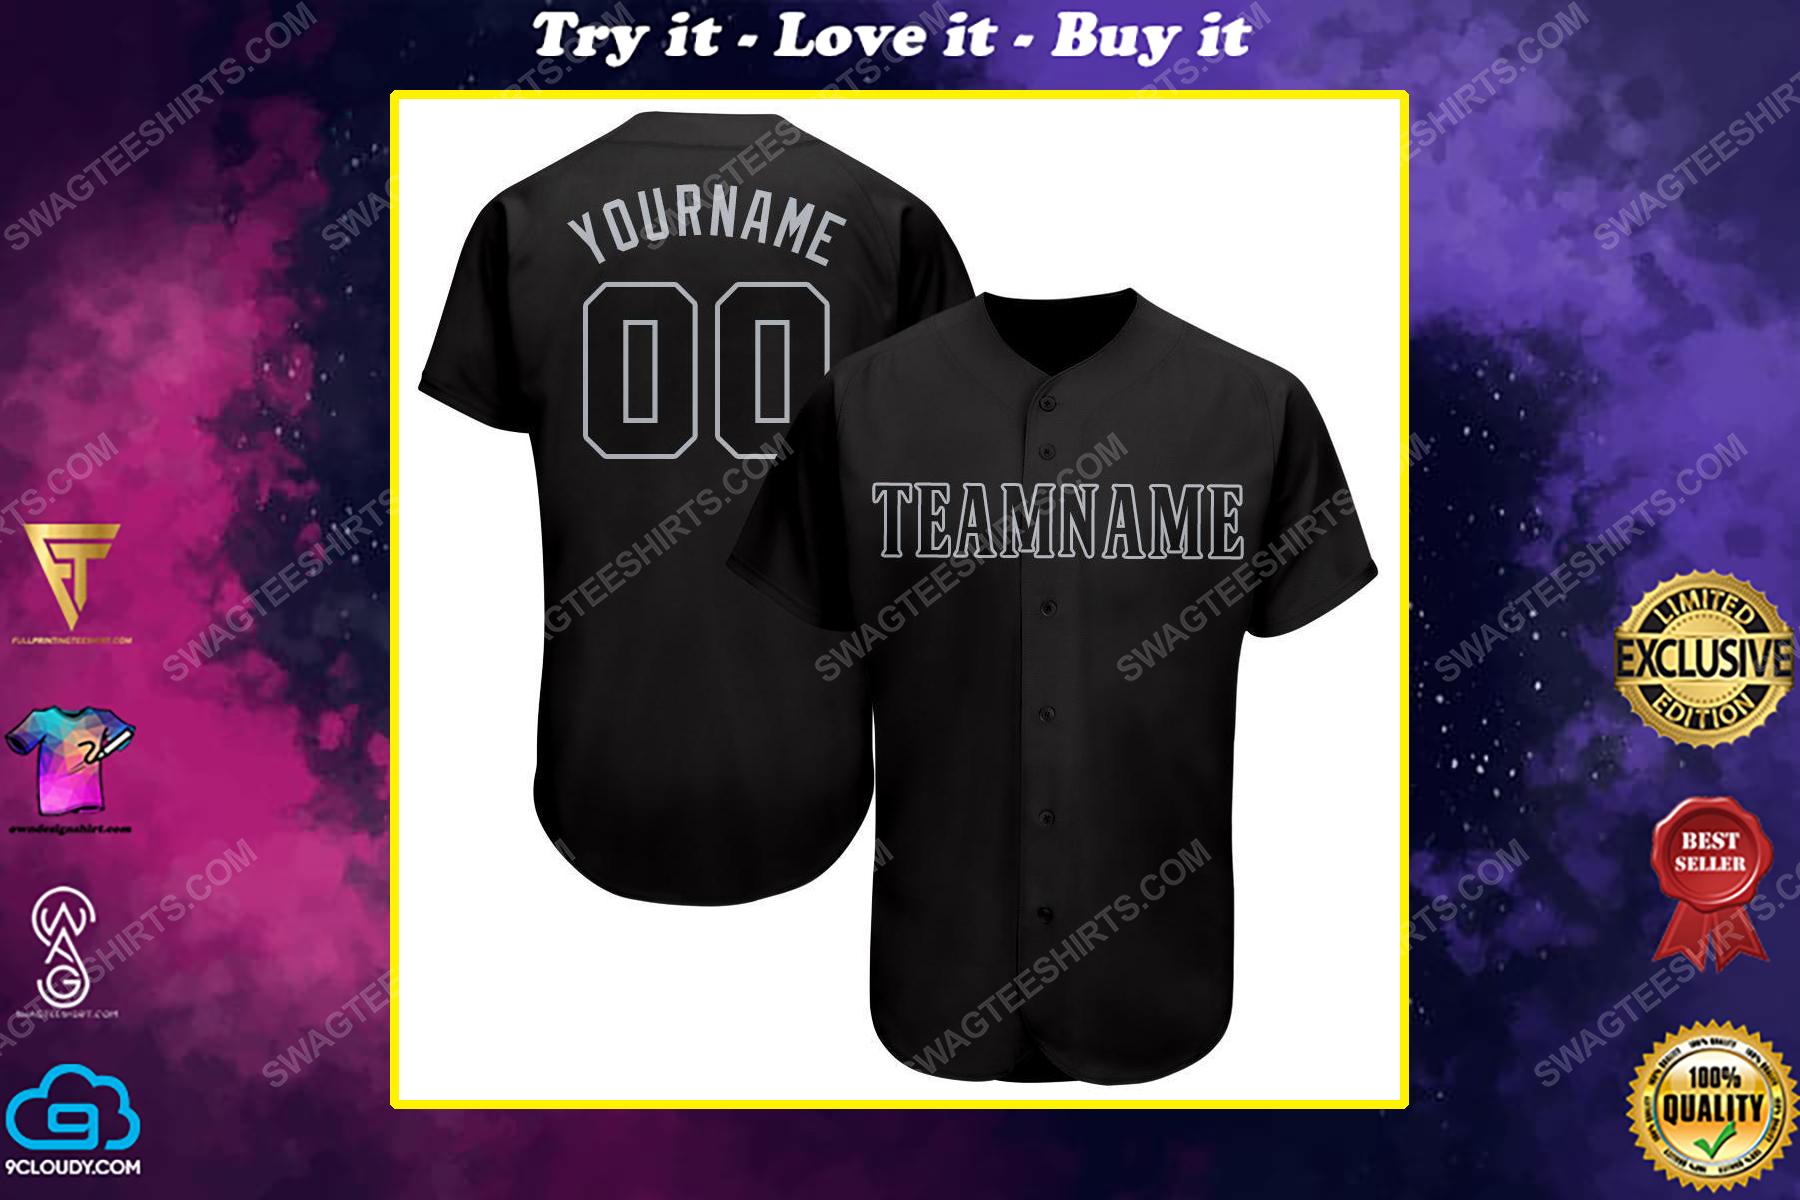 Custom team name seattle mariners mlb full printed baseball jersey